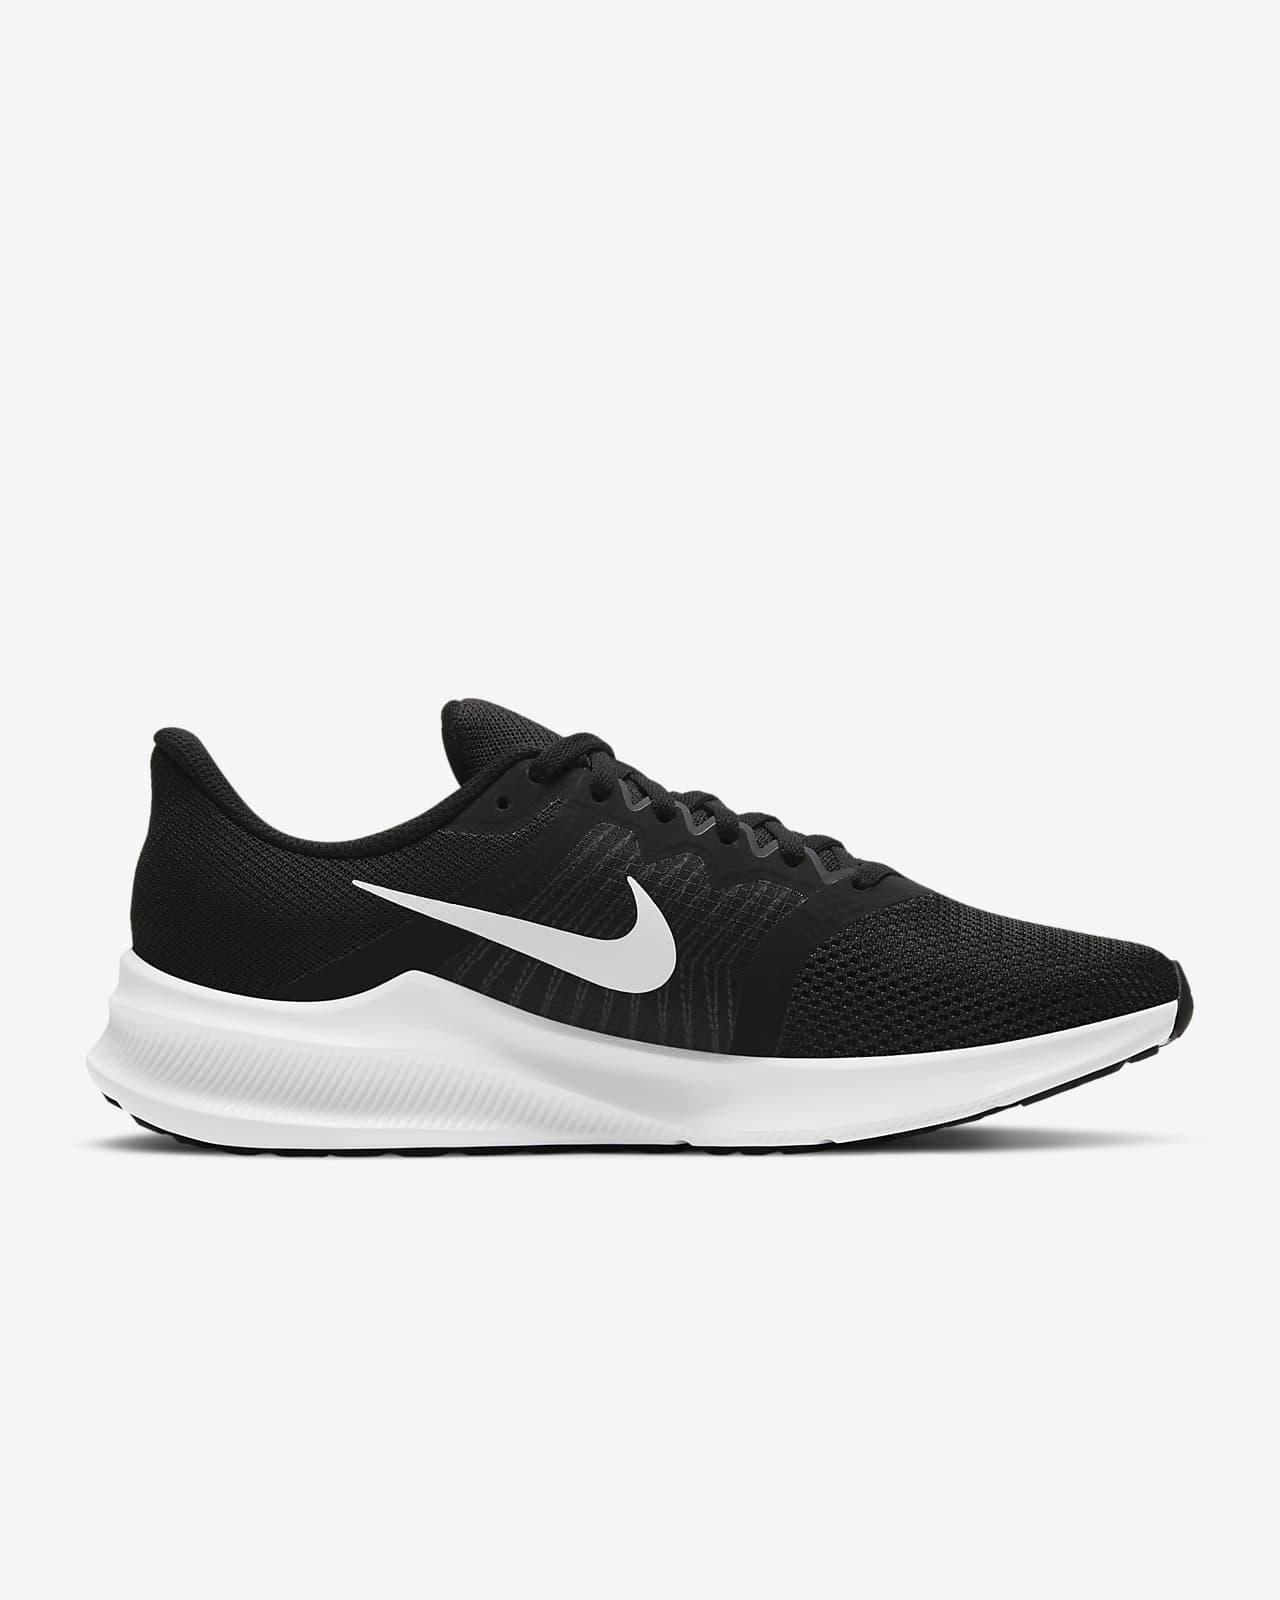 Chaussure de running Nike Downshifter 11 pour Femme. Nike CA